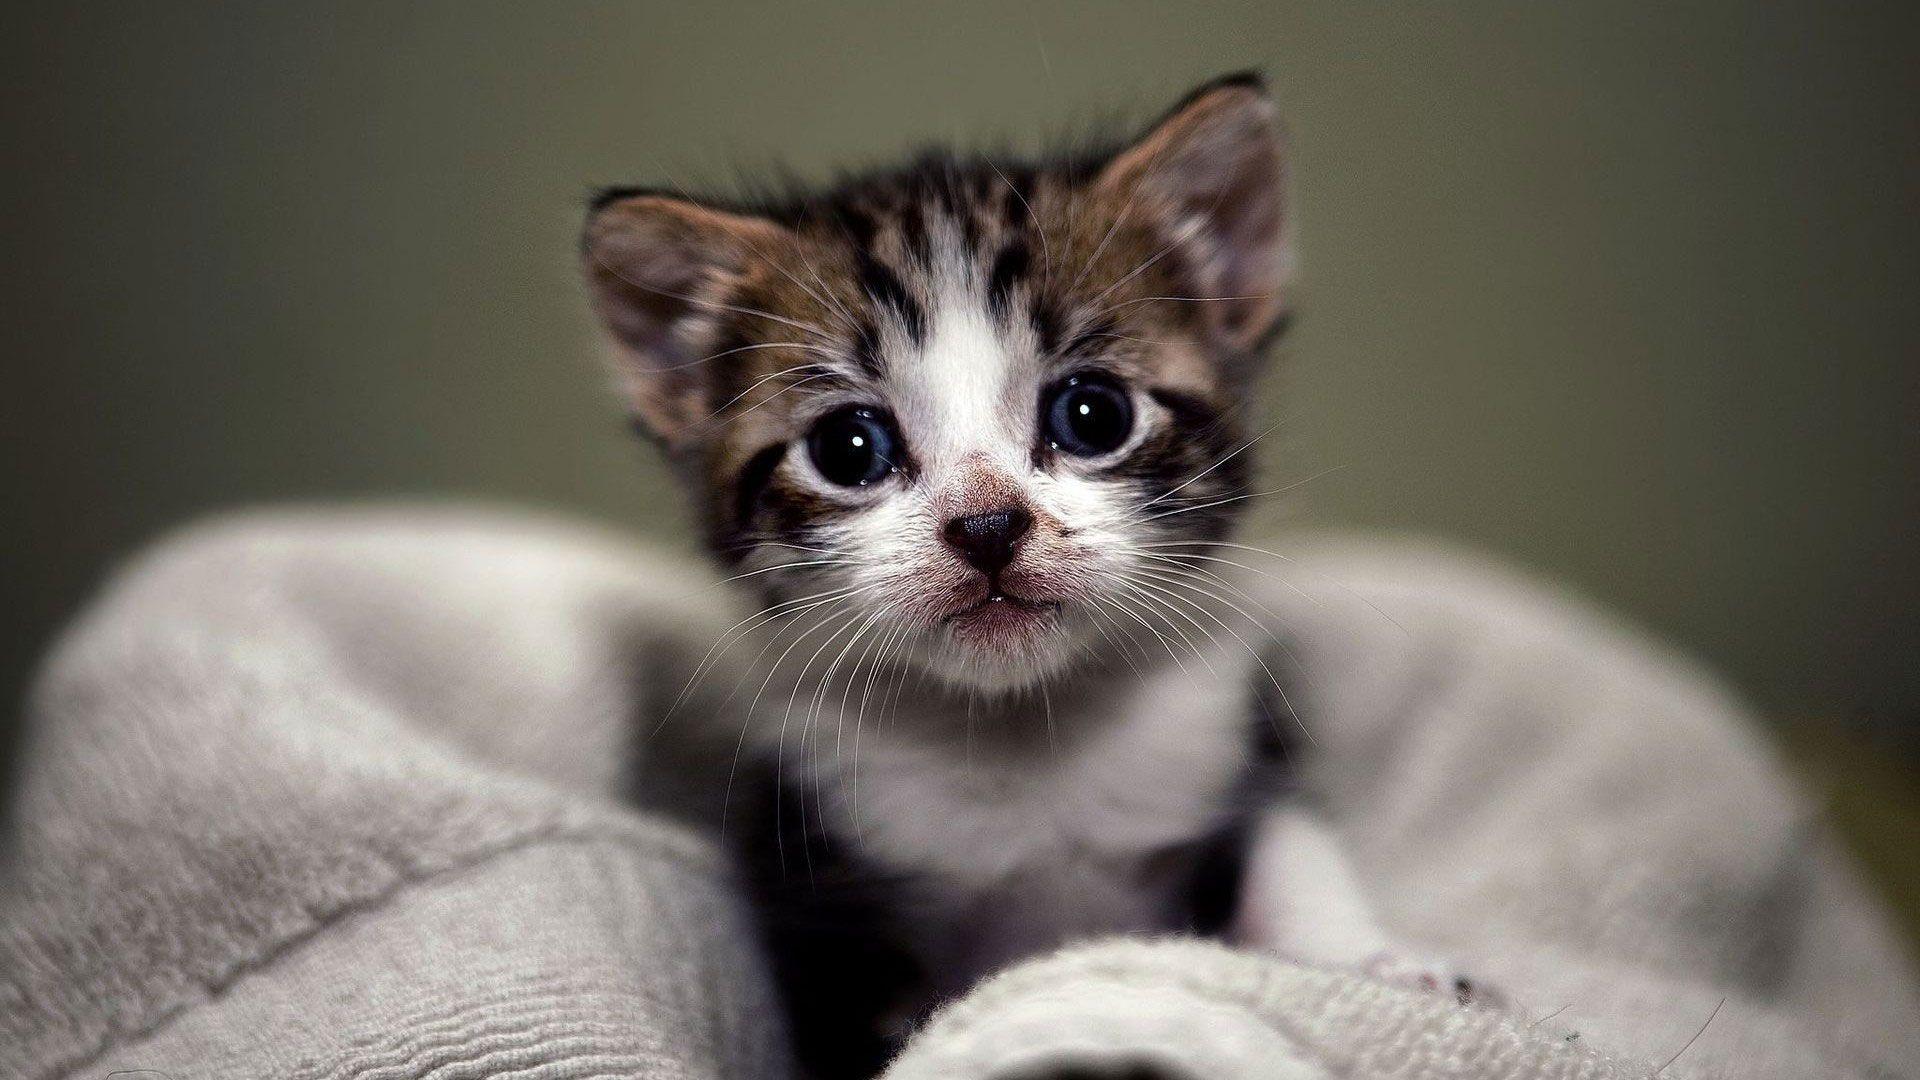 hd pics photos cute small kitten close up hd quality desktop background wallpaper